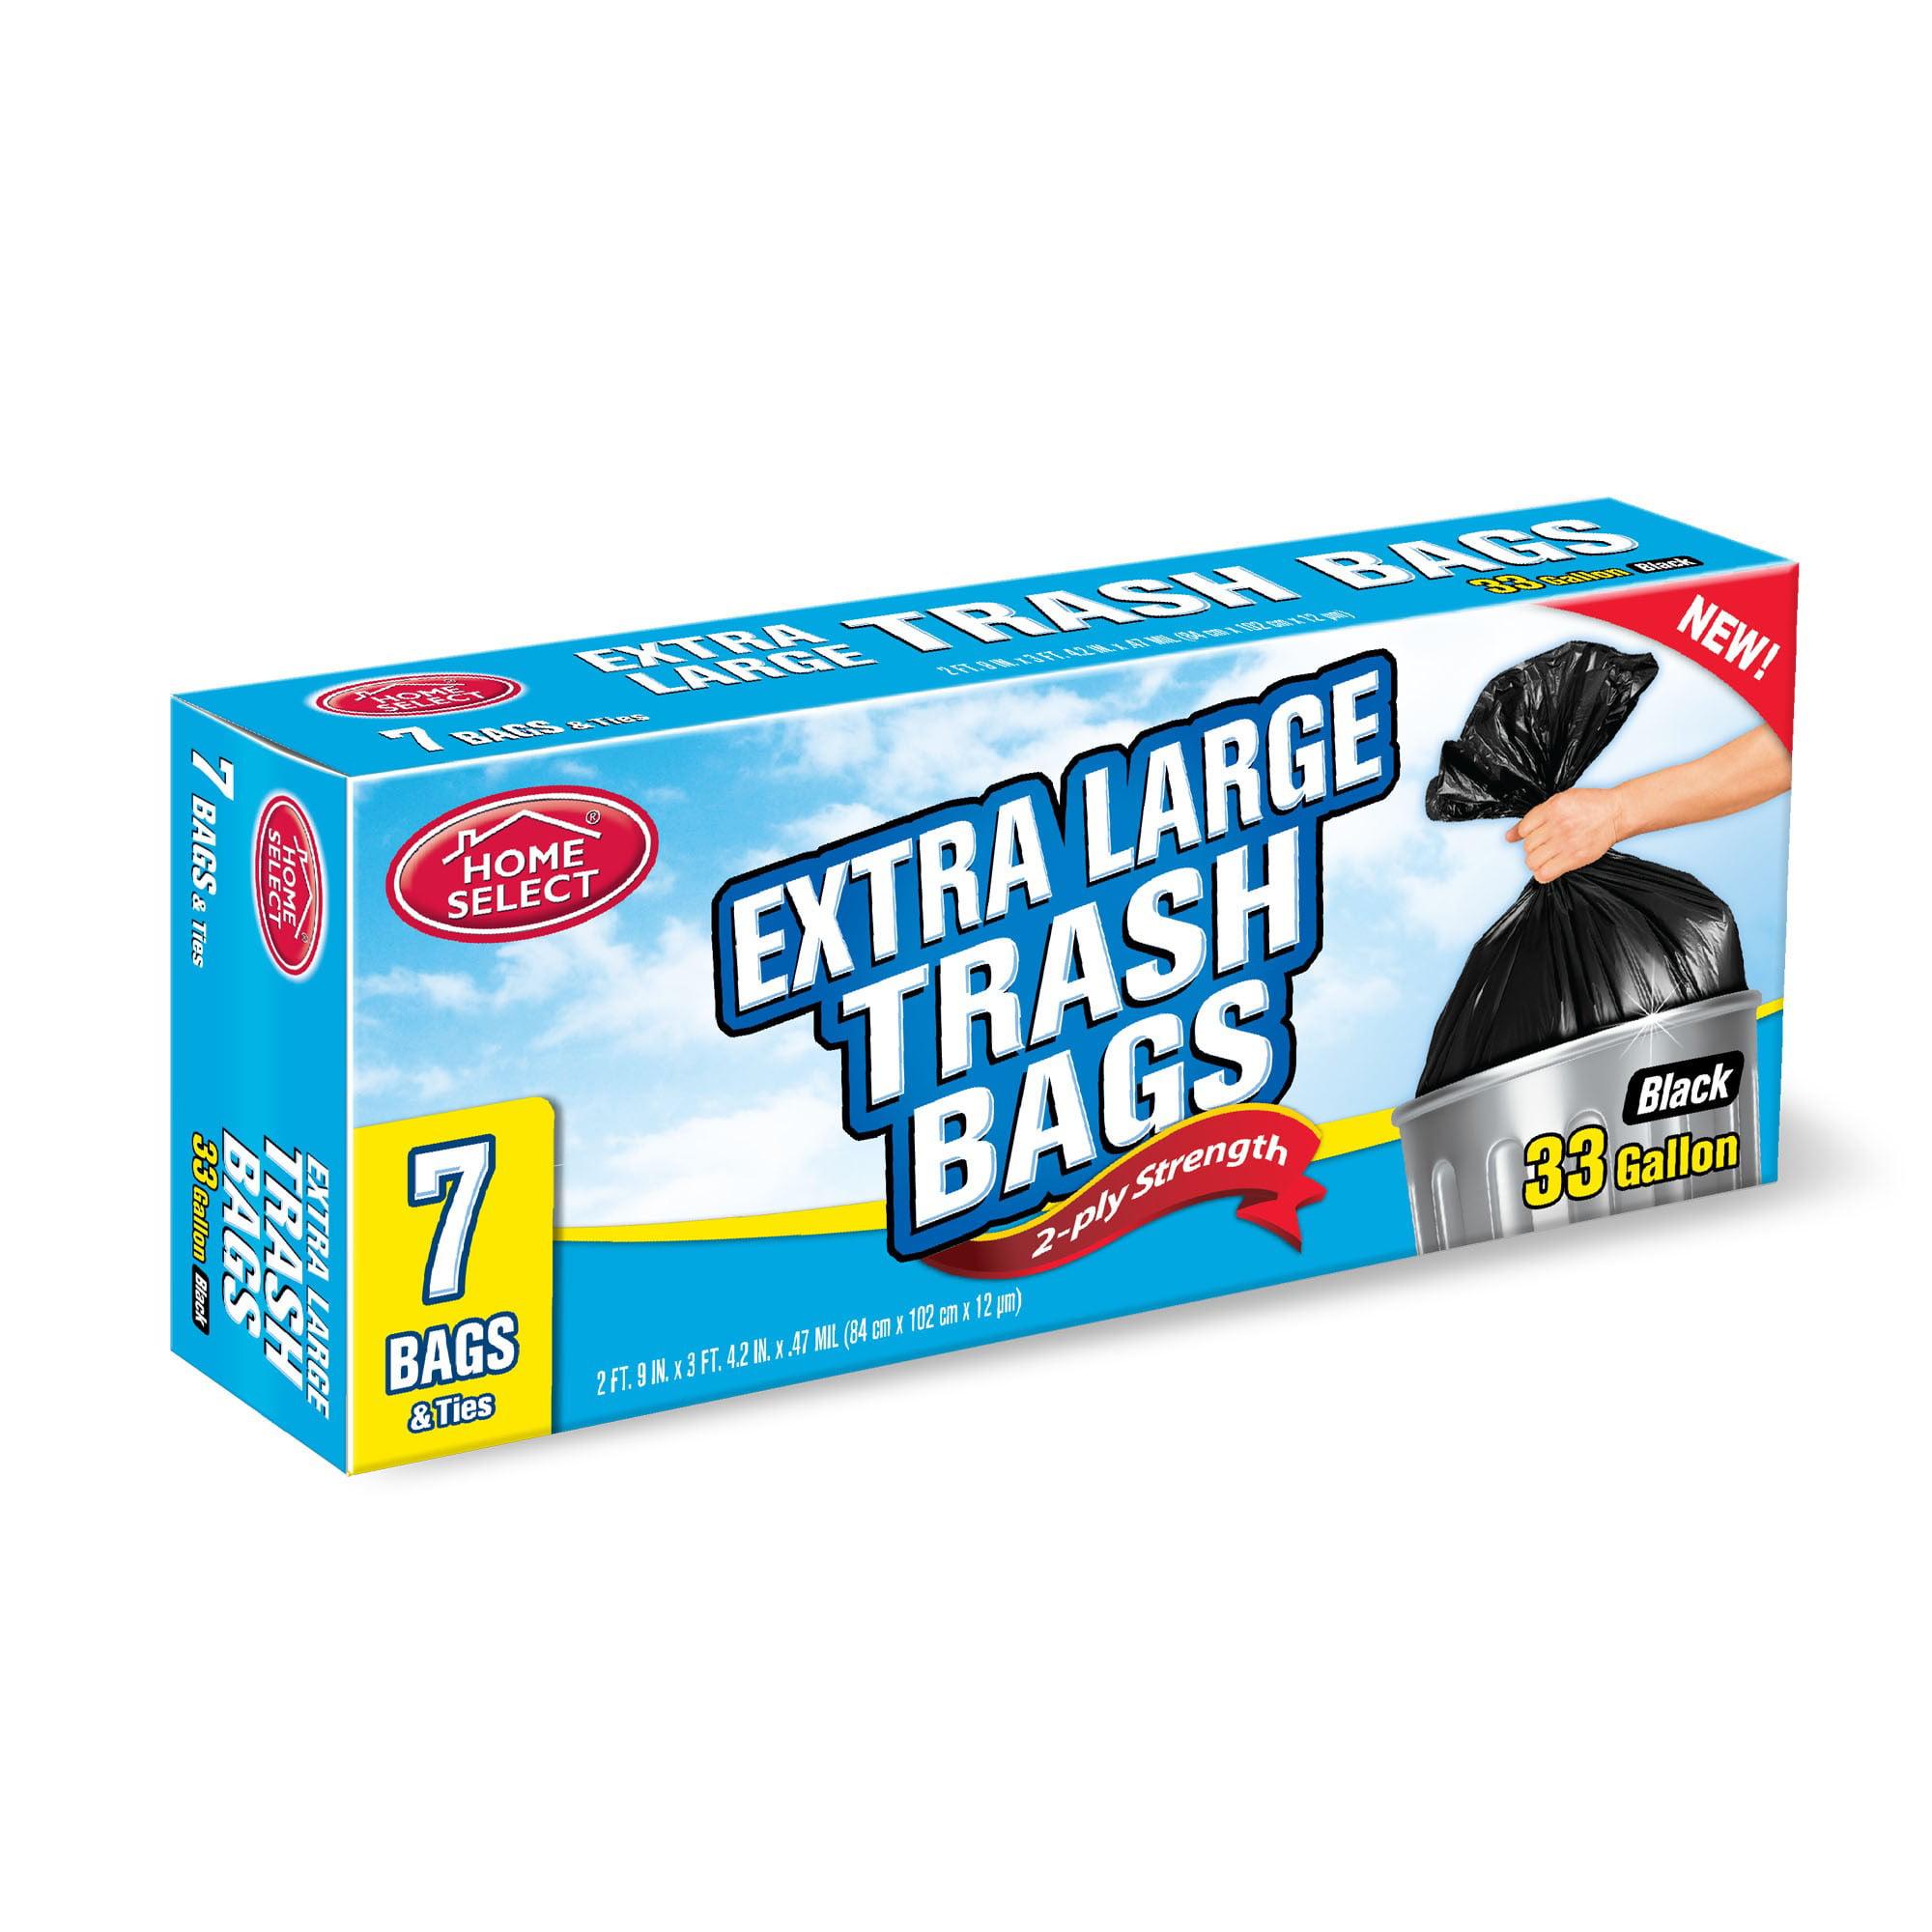 Home Select Trash Bags, 33 gallon, Black, 7 Ct - Walmart.com